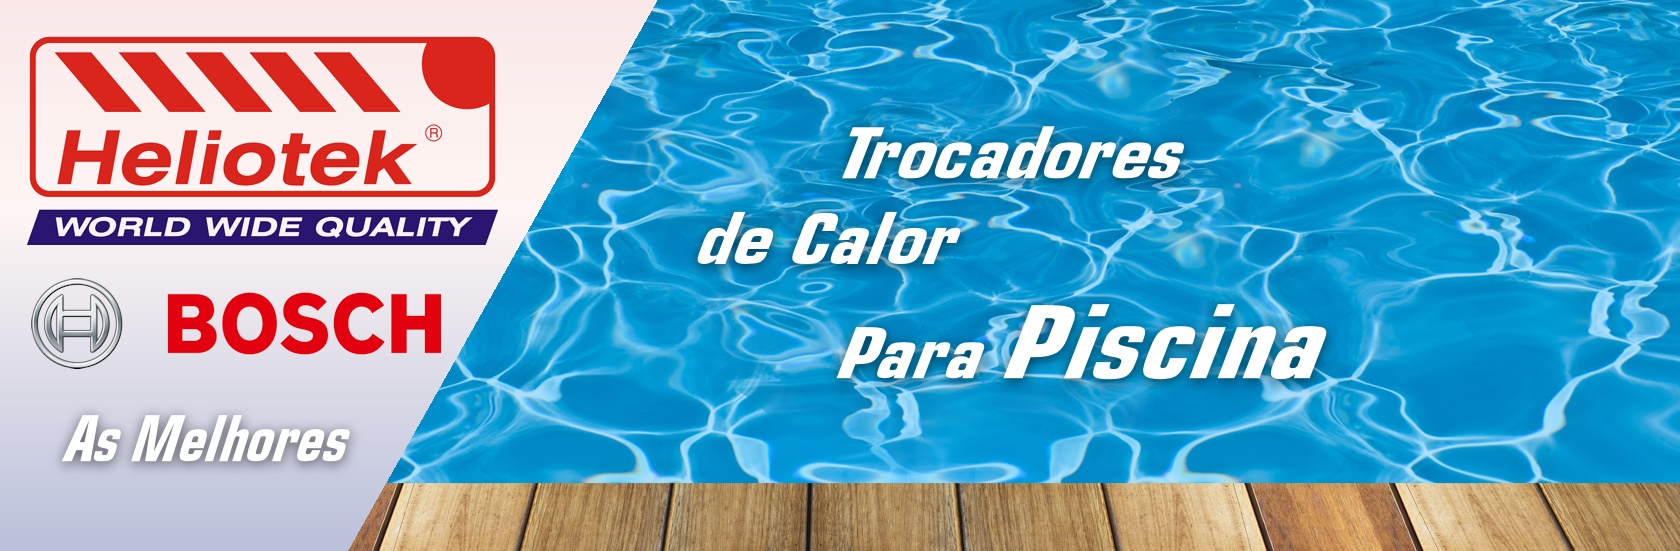 banner_piscina